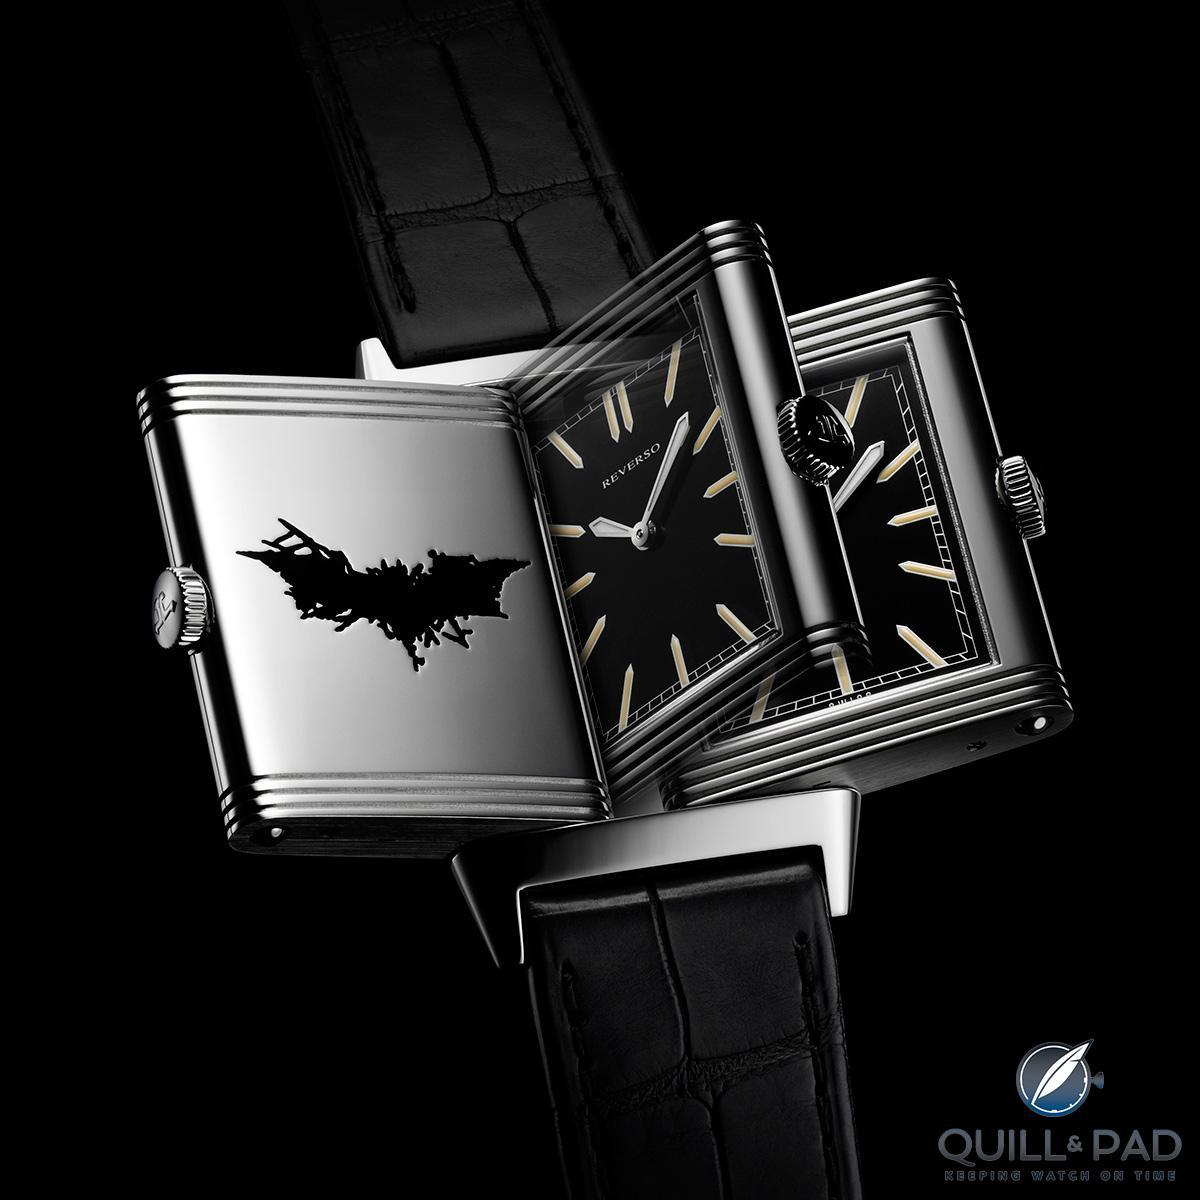 _ @Batman watches by @jaegerlecoultre @RJ_ROMAINJEROME @Montegrappa1912. Click http://t.co/x6eey5f0P2 http://t.co/BlVH5NTTBz